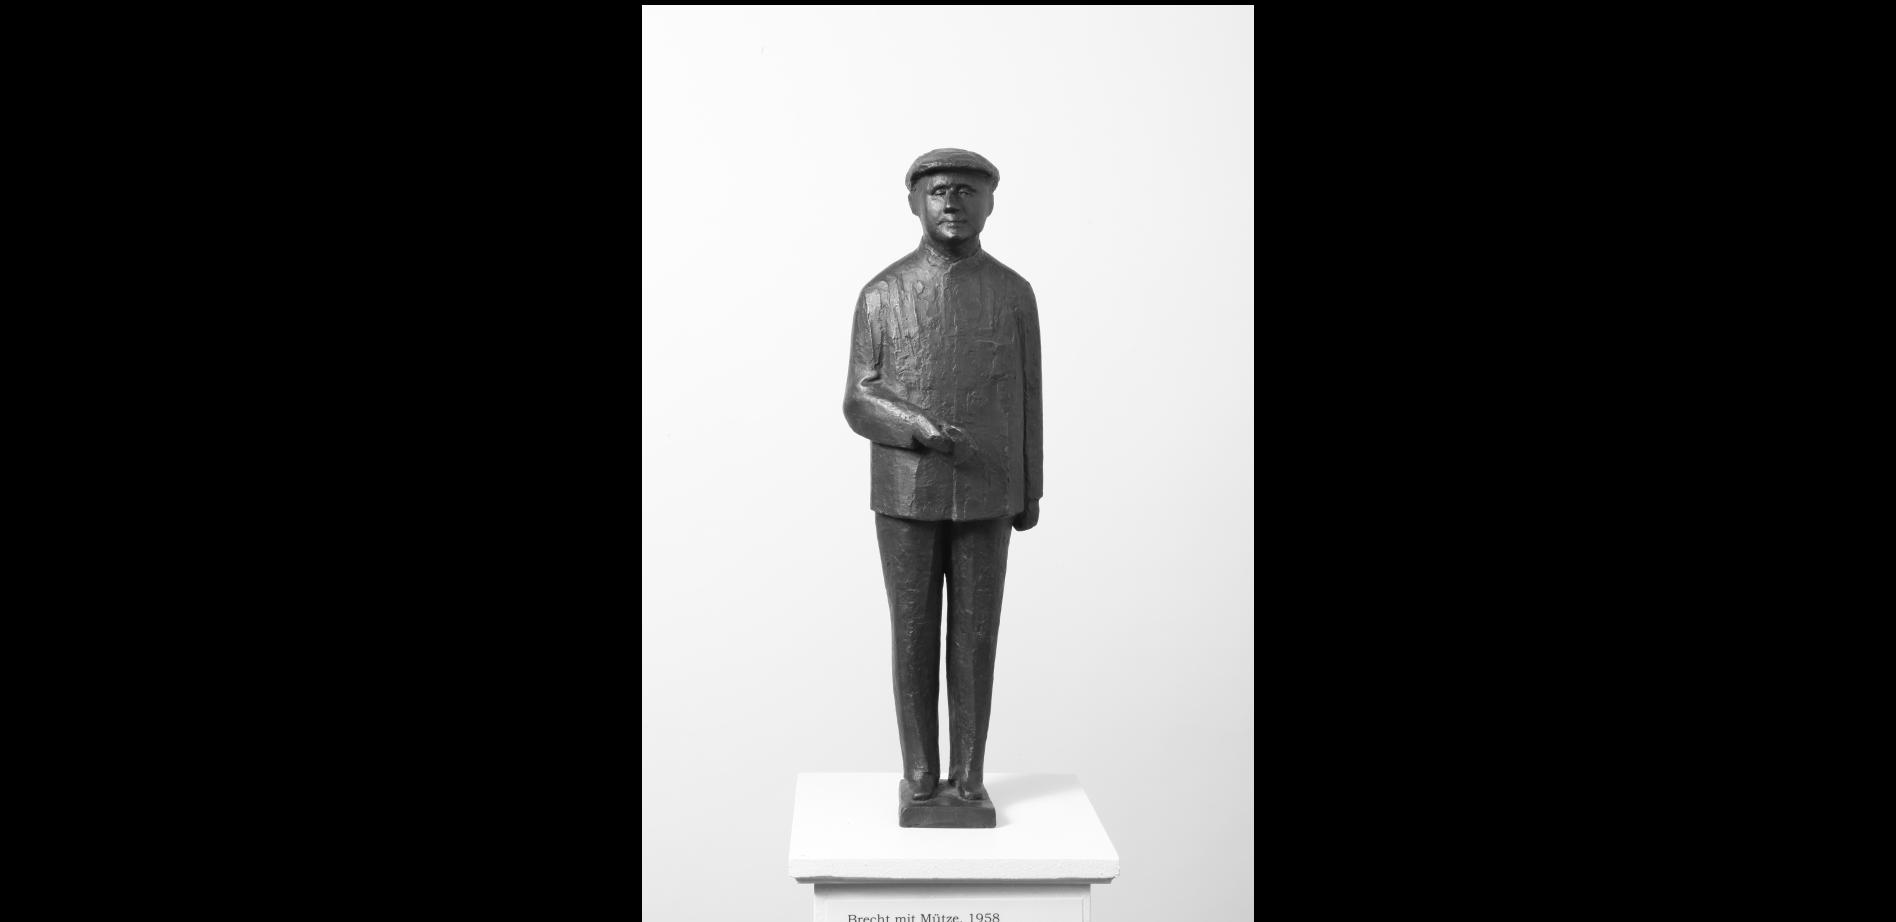 Brecht © Wolfgang van Gulijk